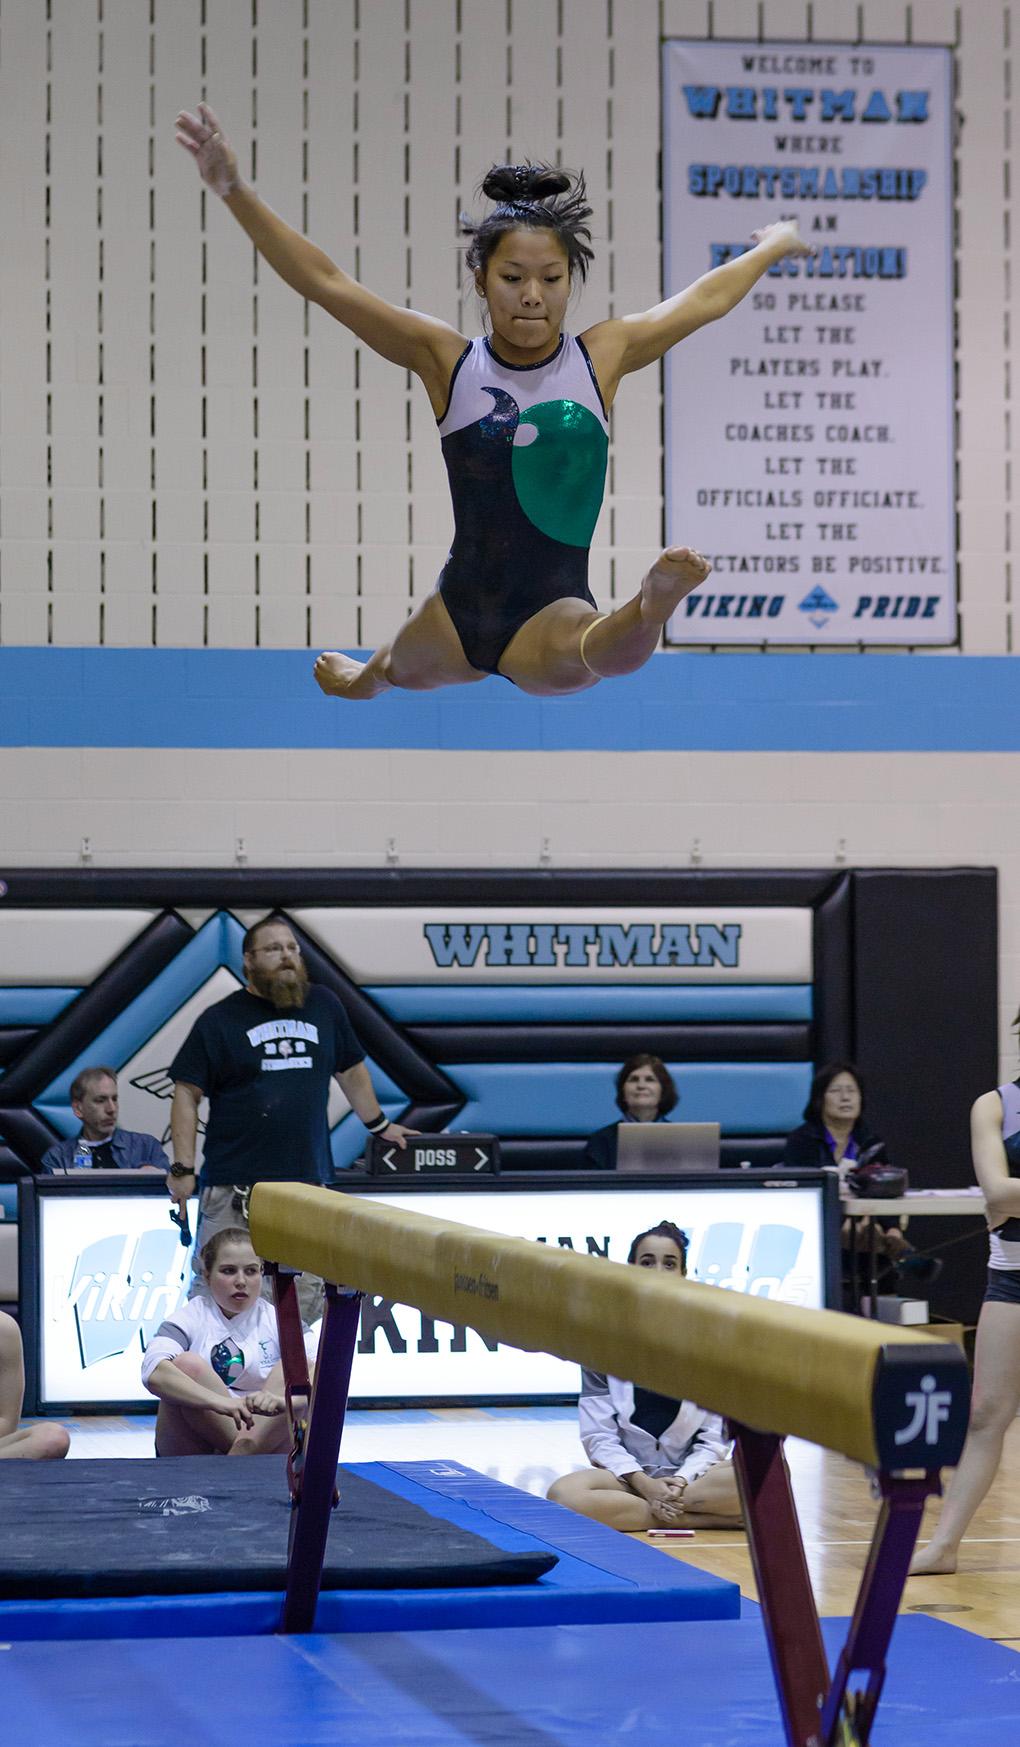 Winwin gymnastics - Walter Johnson High School Gymnast